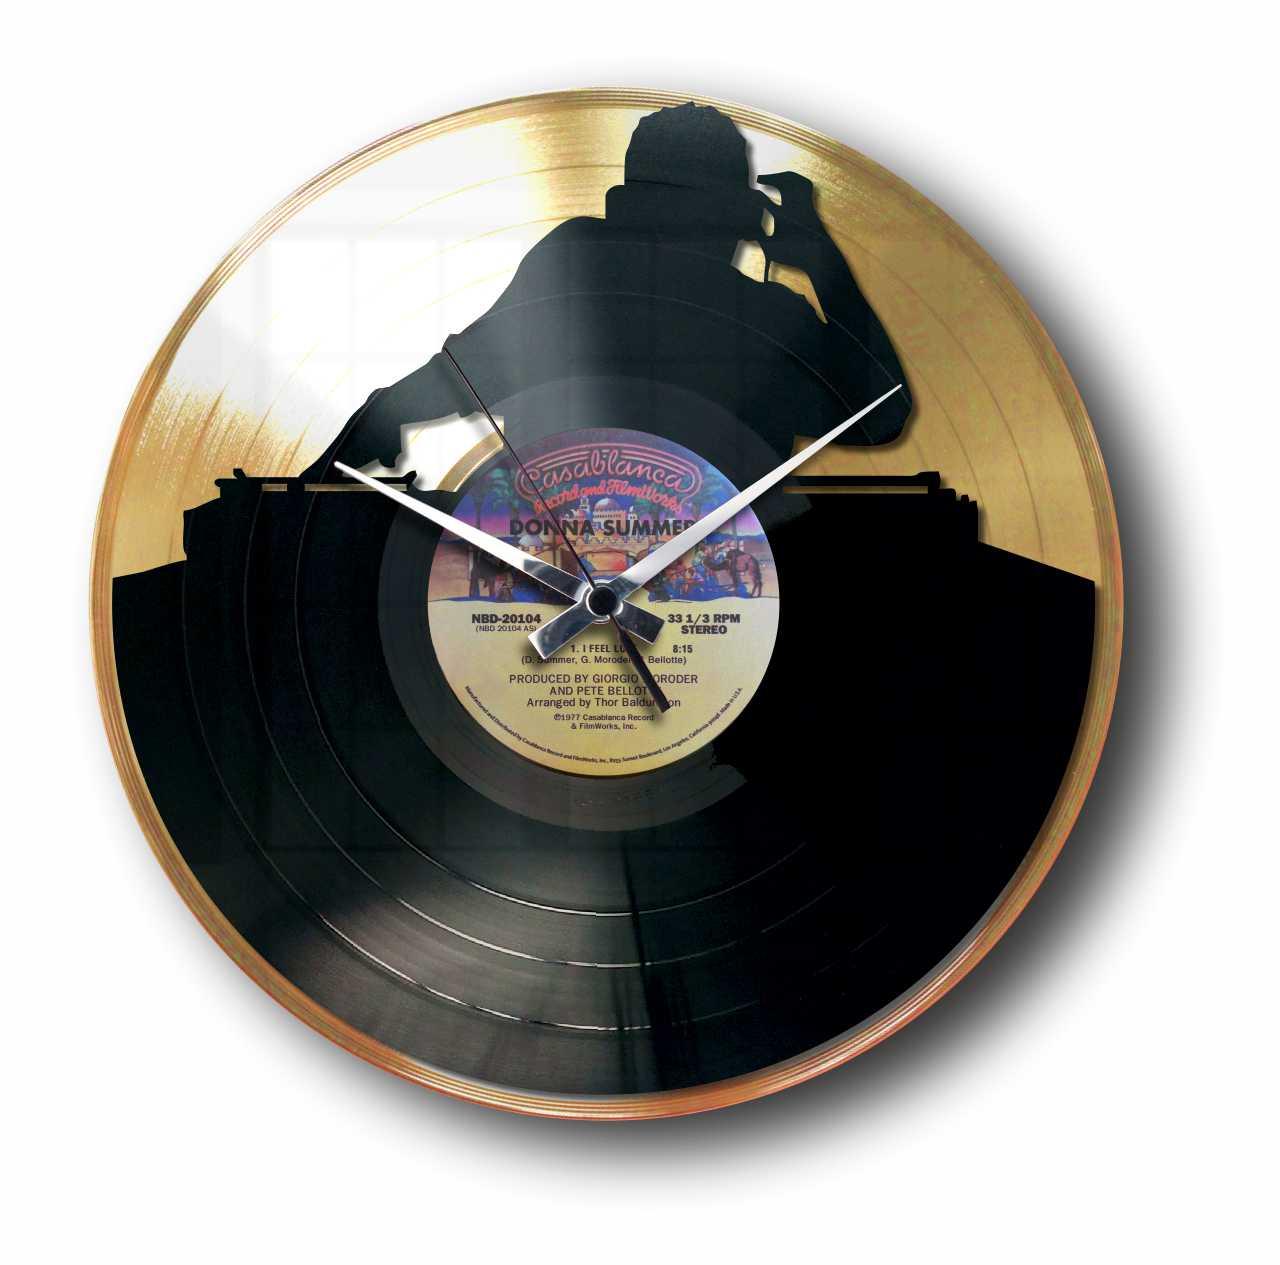 NO SYNC - GOLD or SILVER VINYL RECORD WALL CLOCK